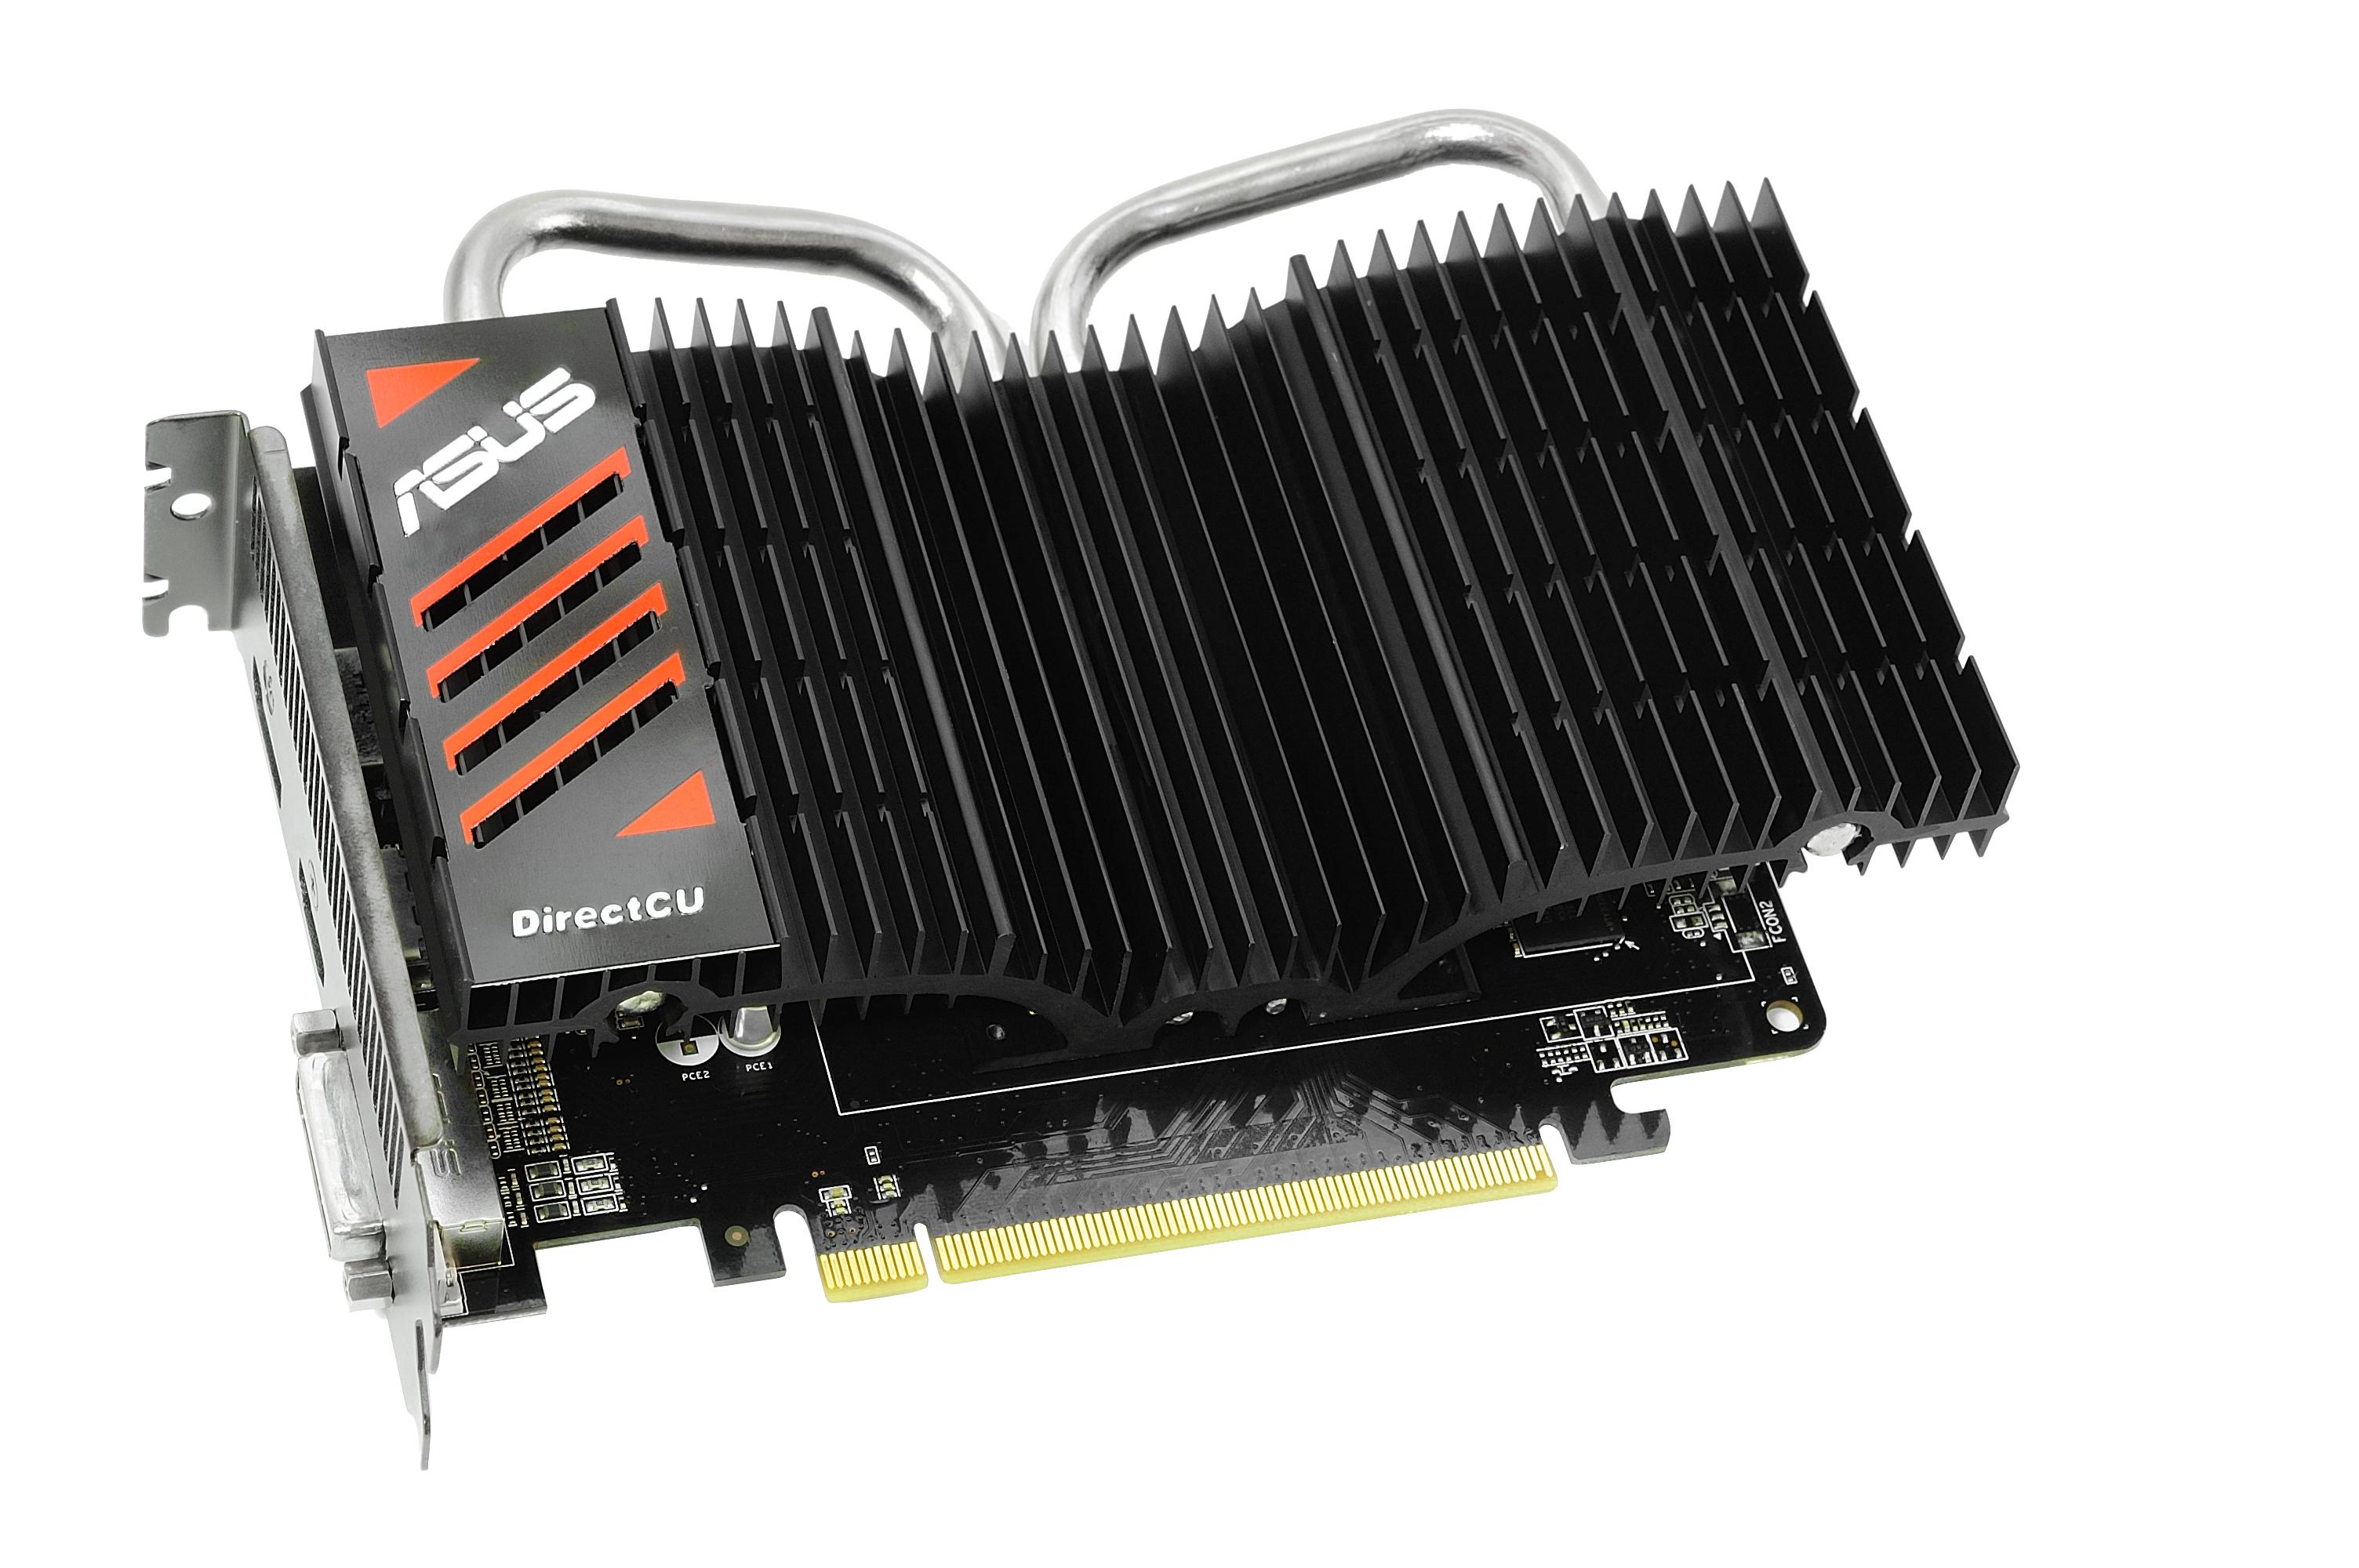 HD7750-DCSL-1GD5